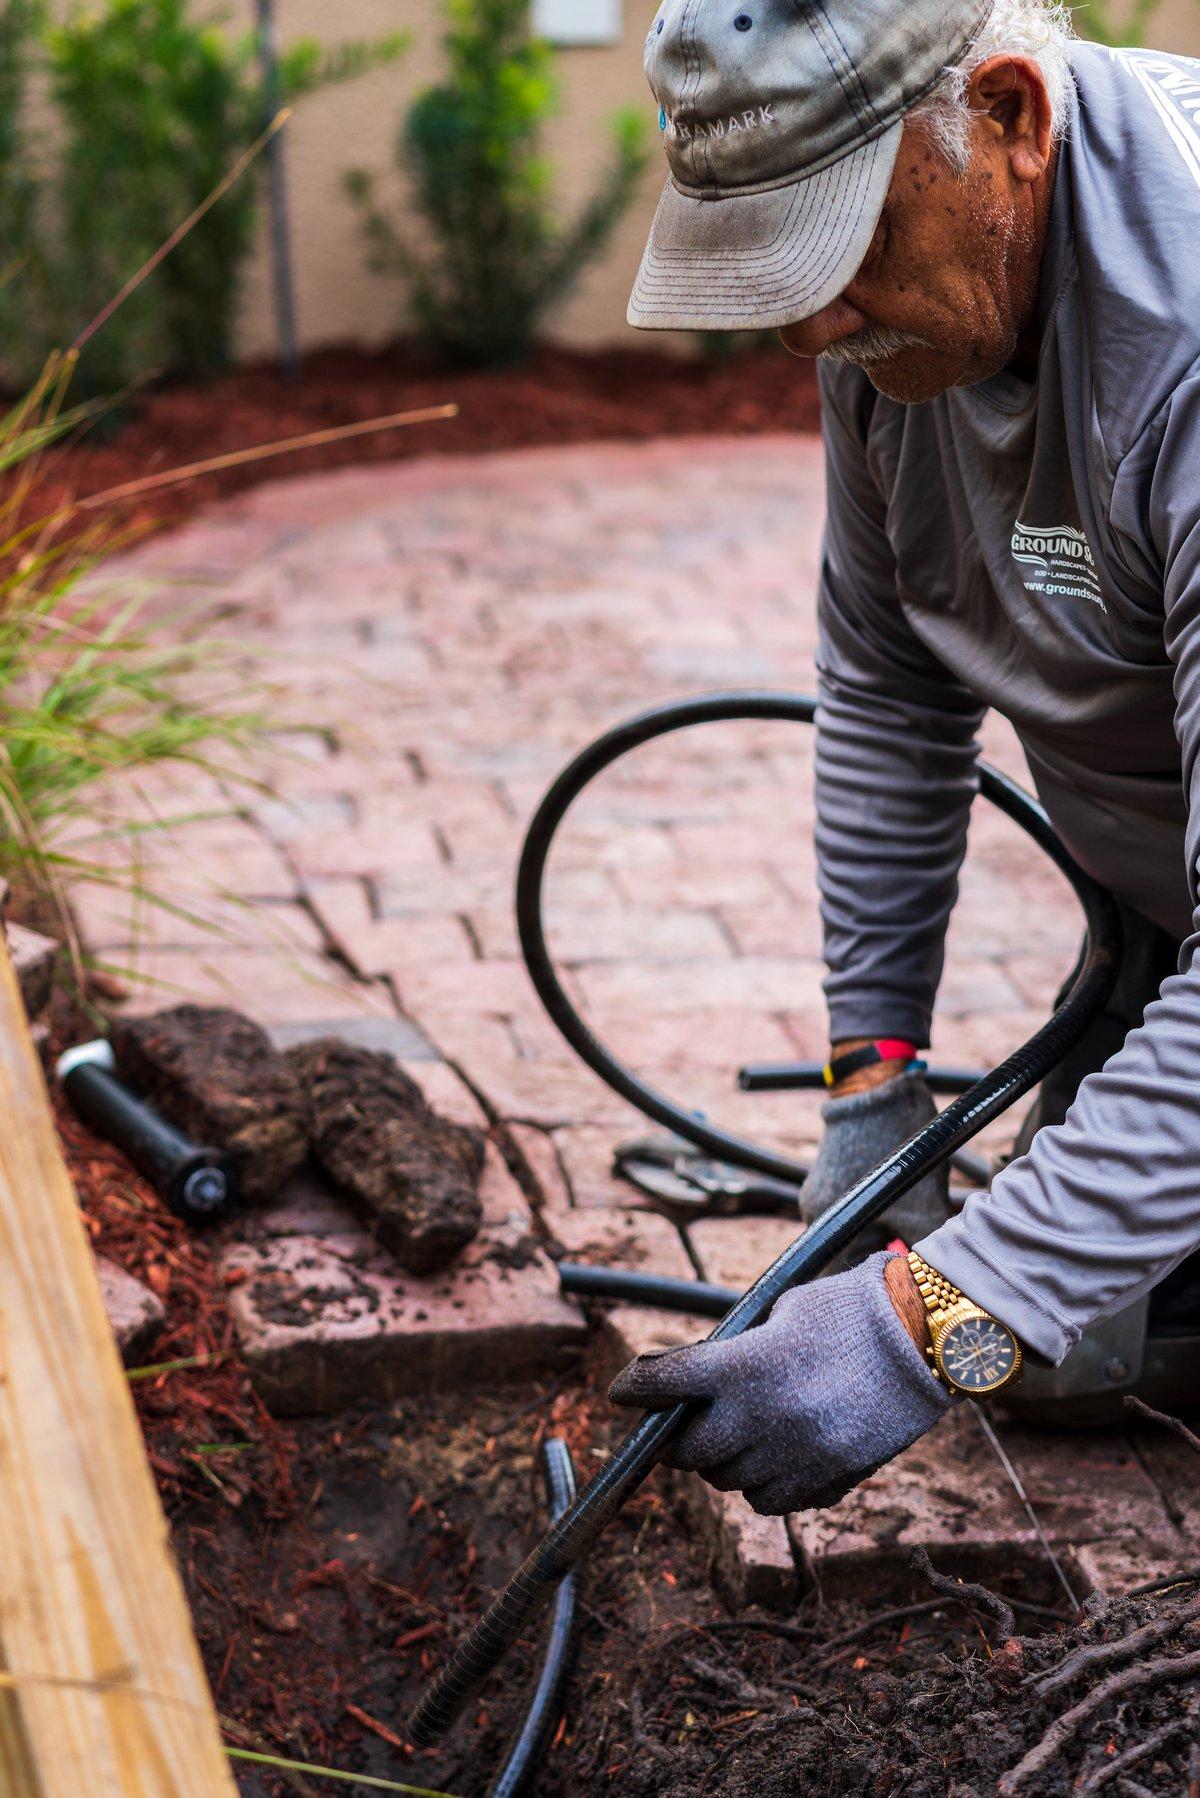 irrigation installation near paver patio